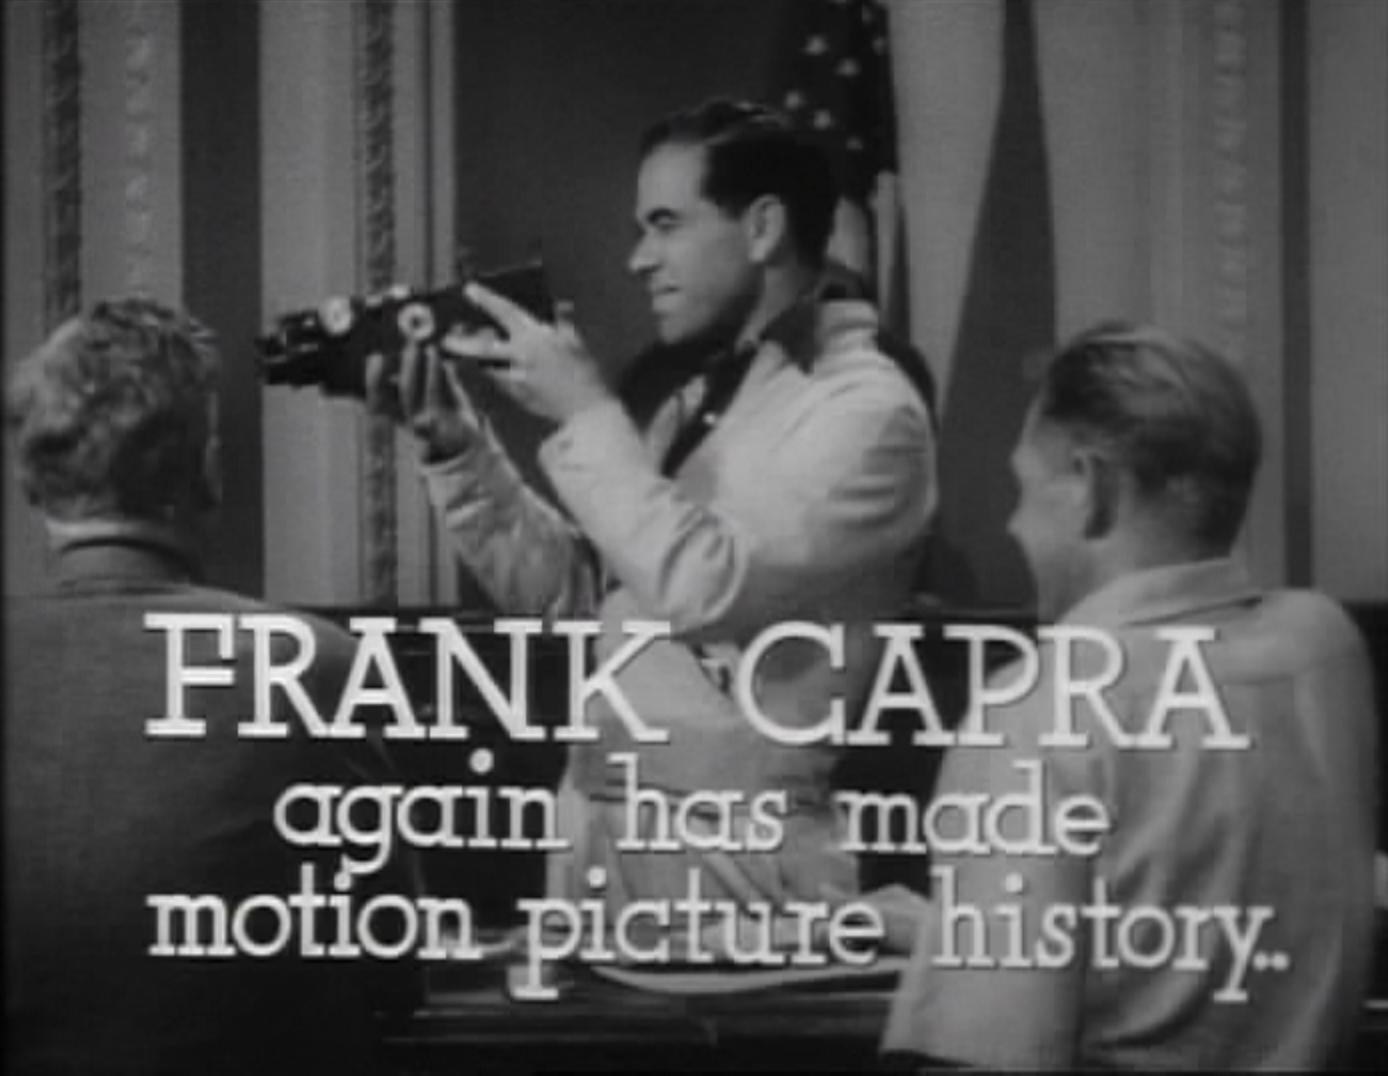 frank capra movies